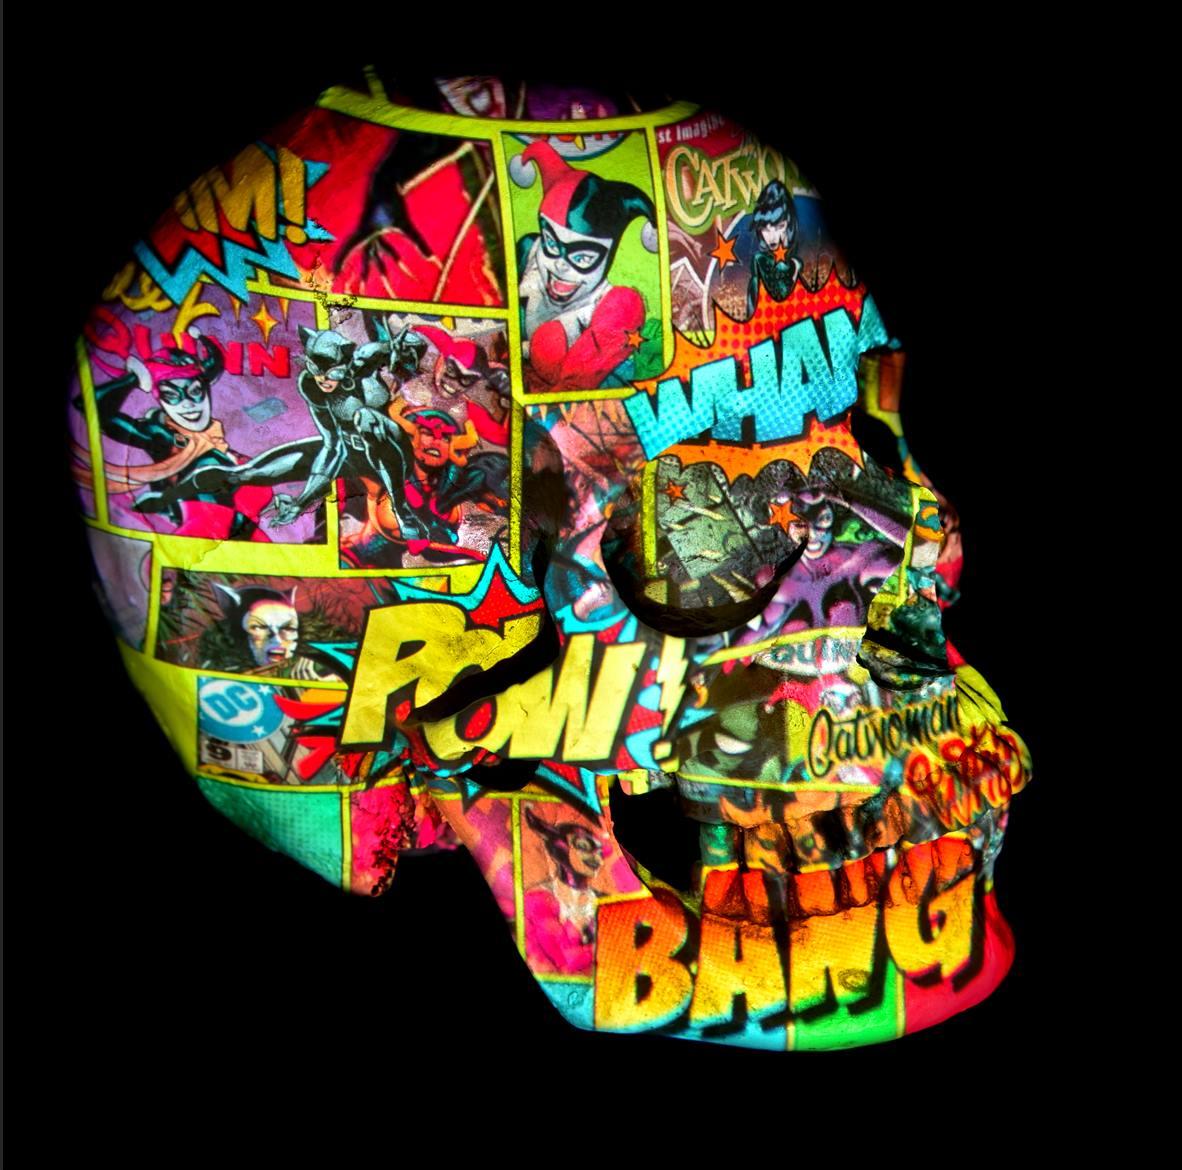 skull biarritz